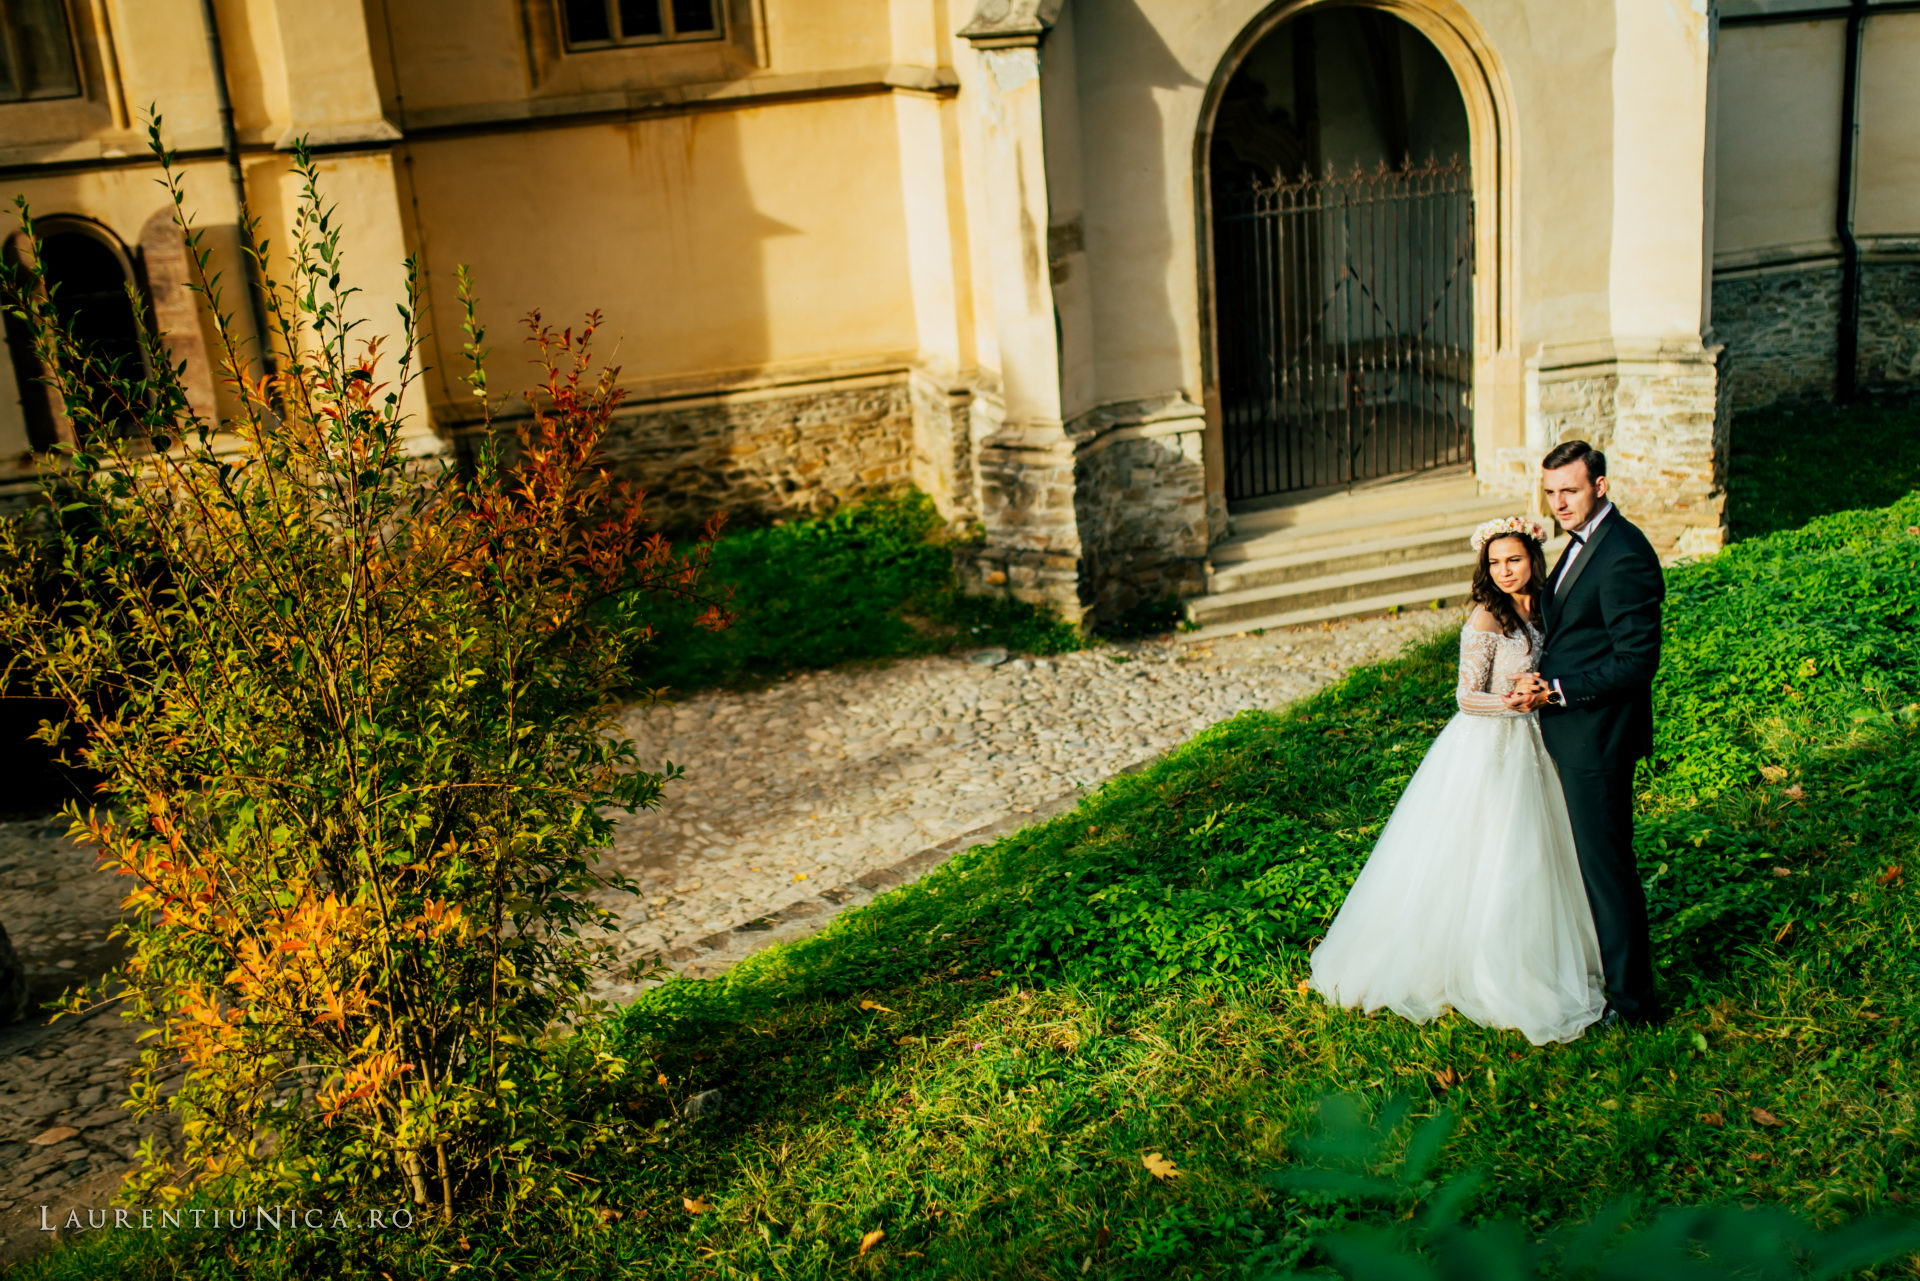 lili-si-dan-fotografii-nunta-after-wedding-sighisoara-laurentiu-nica20